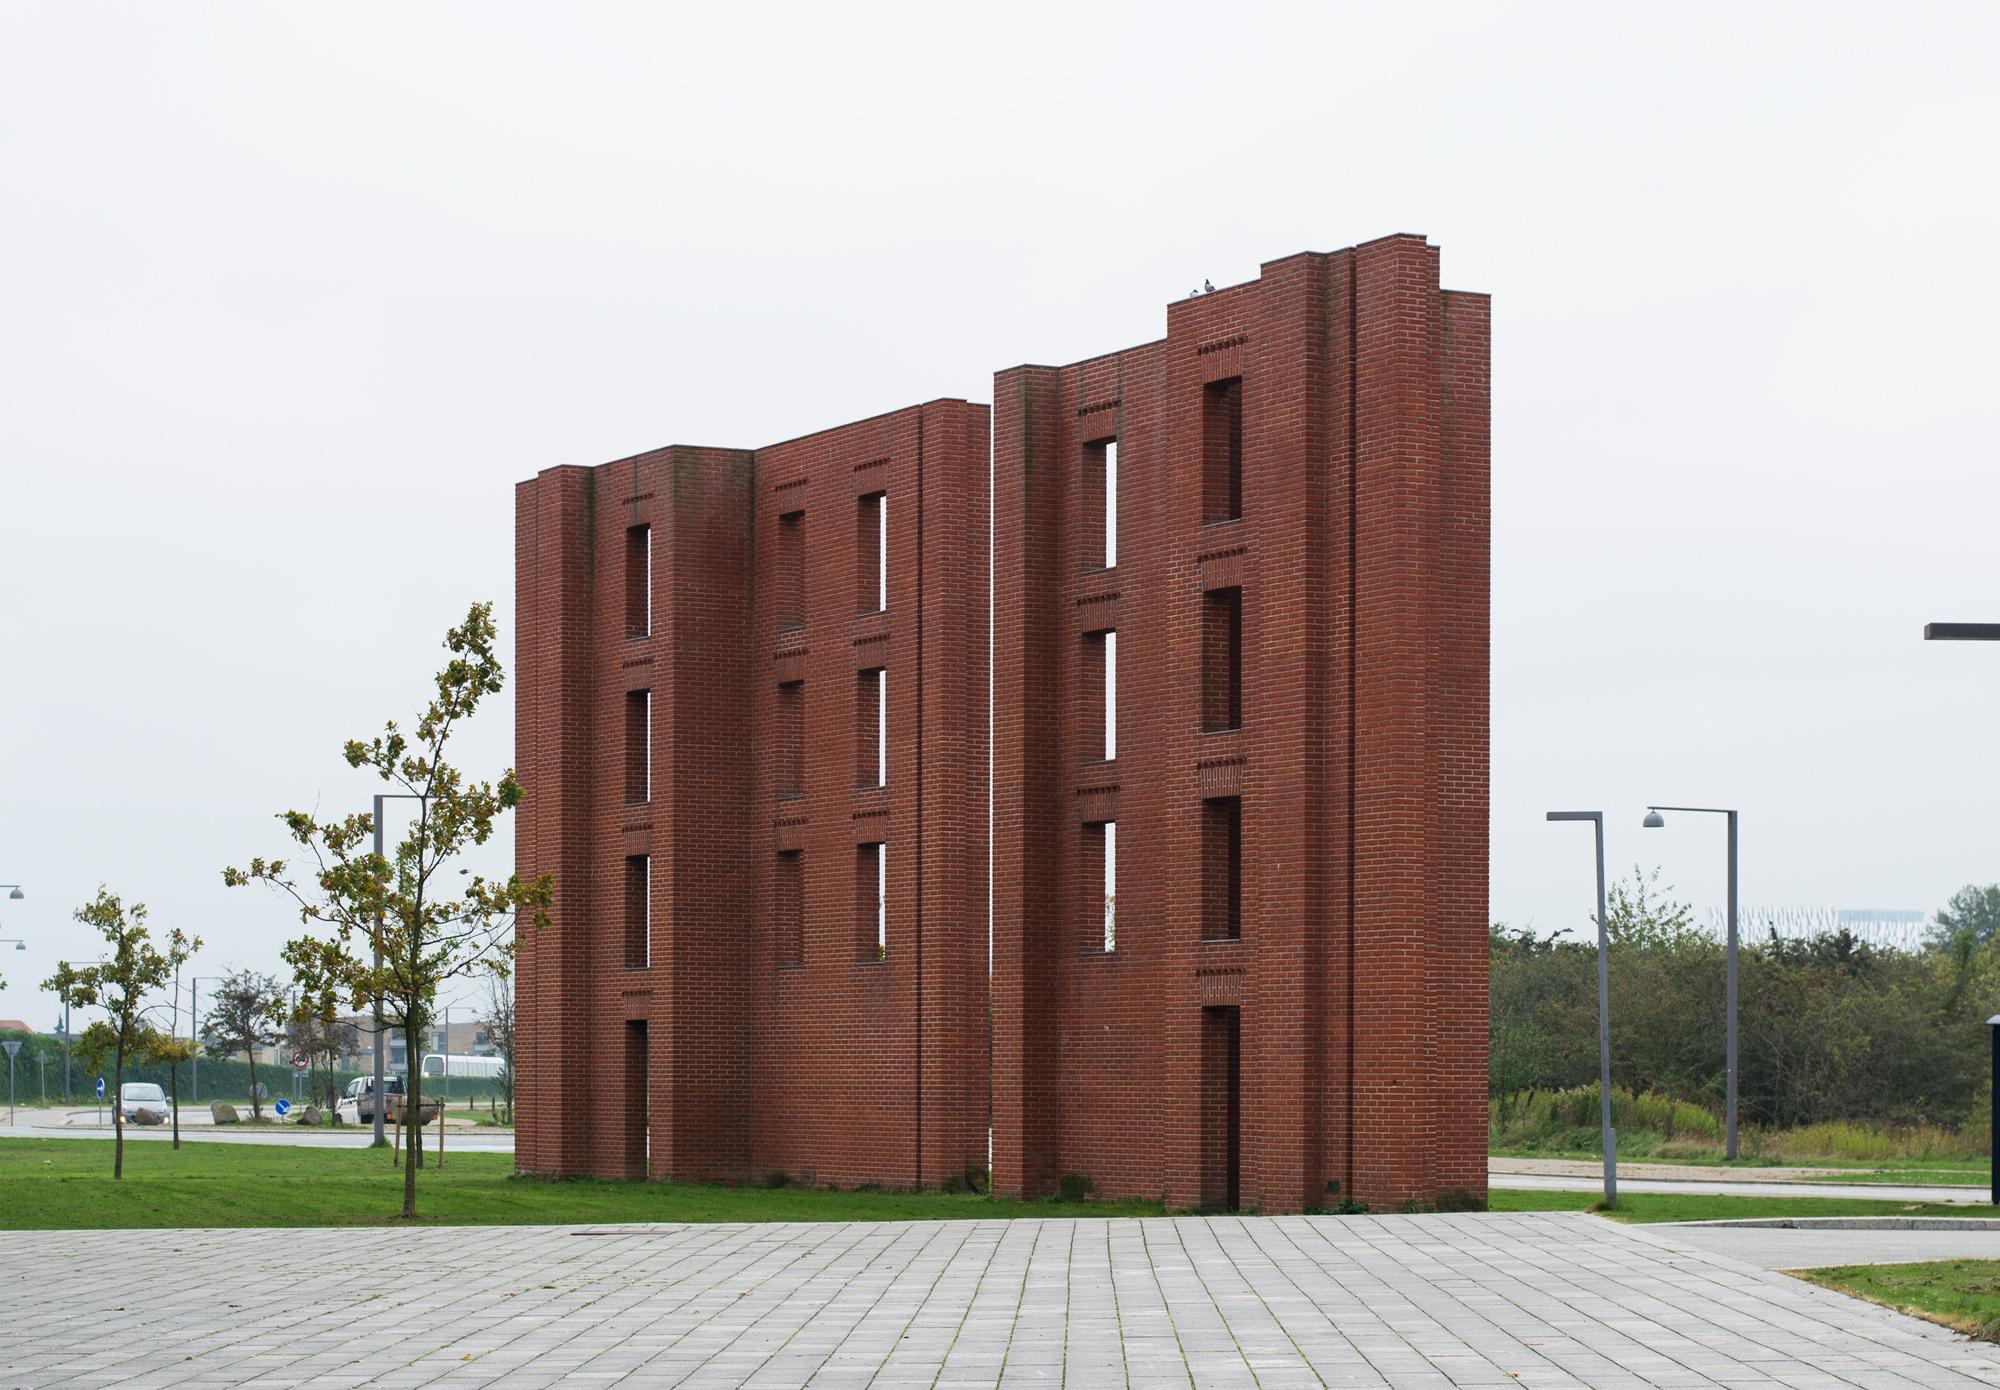 urbanbacklog-copenhagen-per-kirkeby-1.jpg